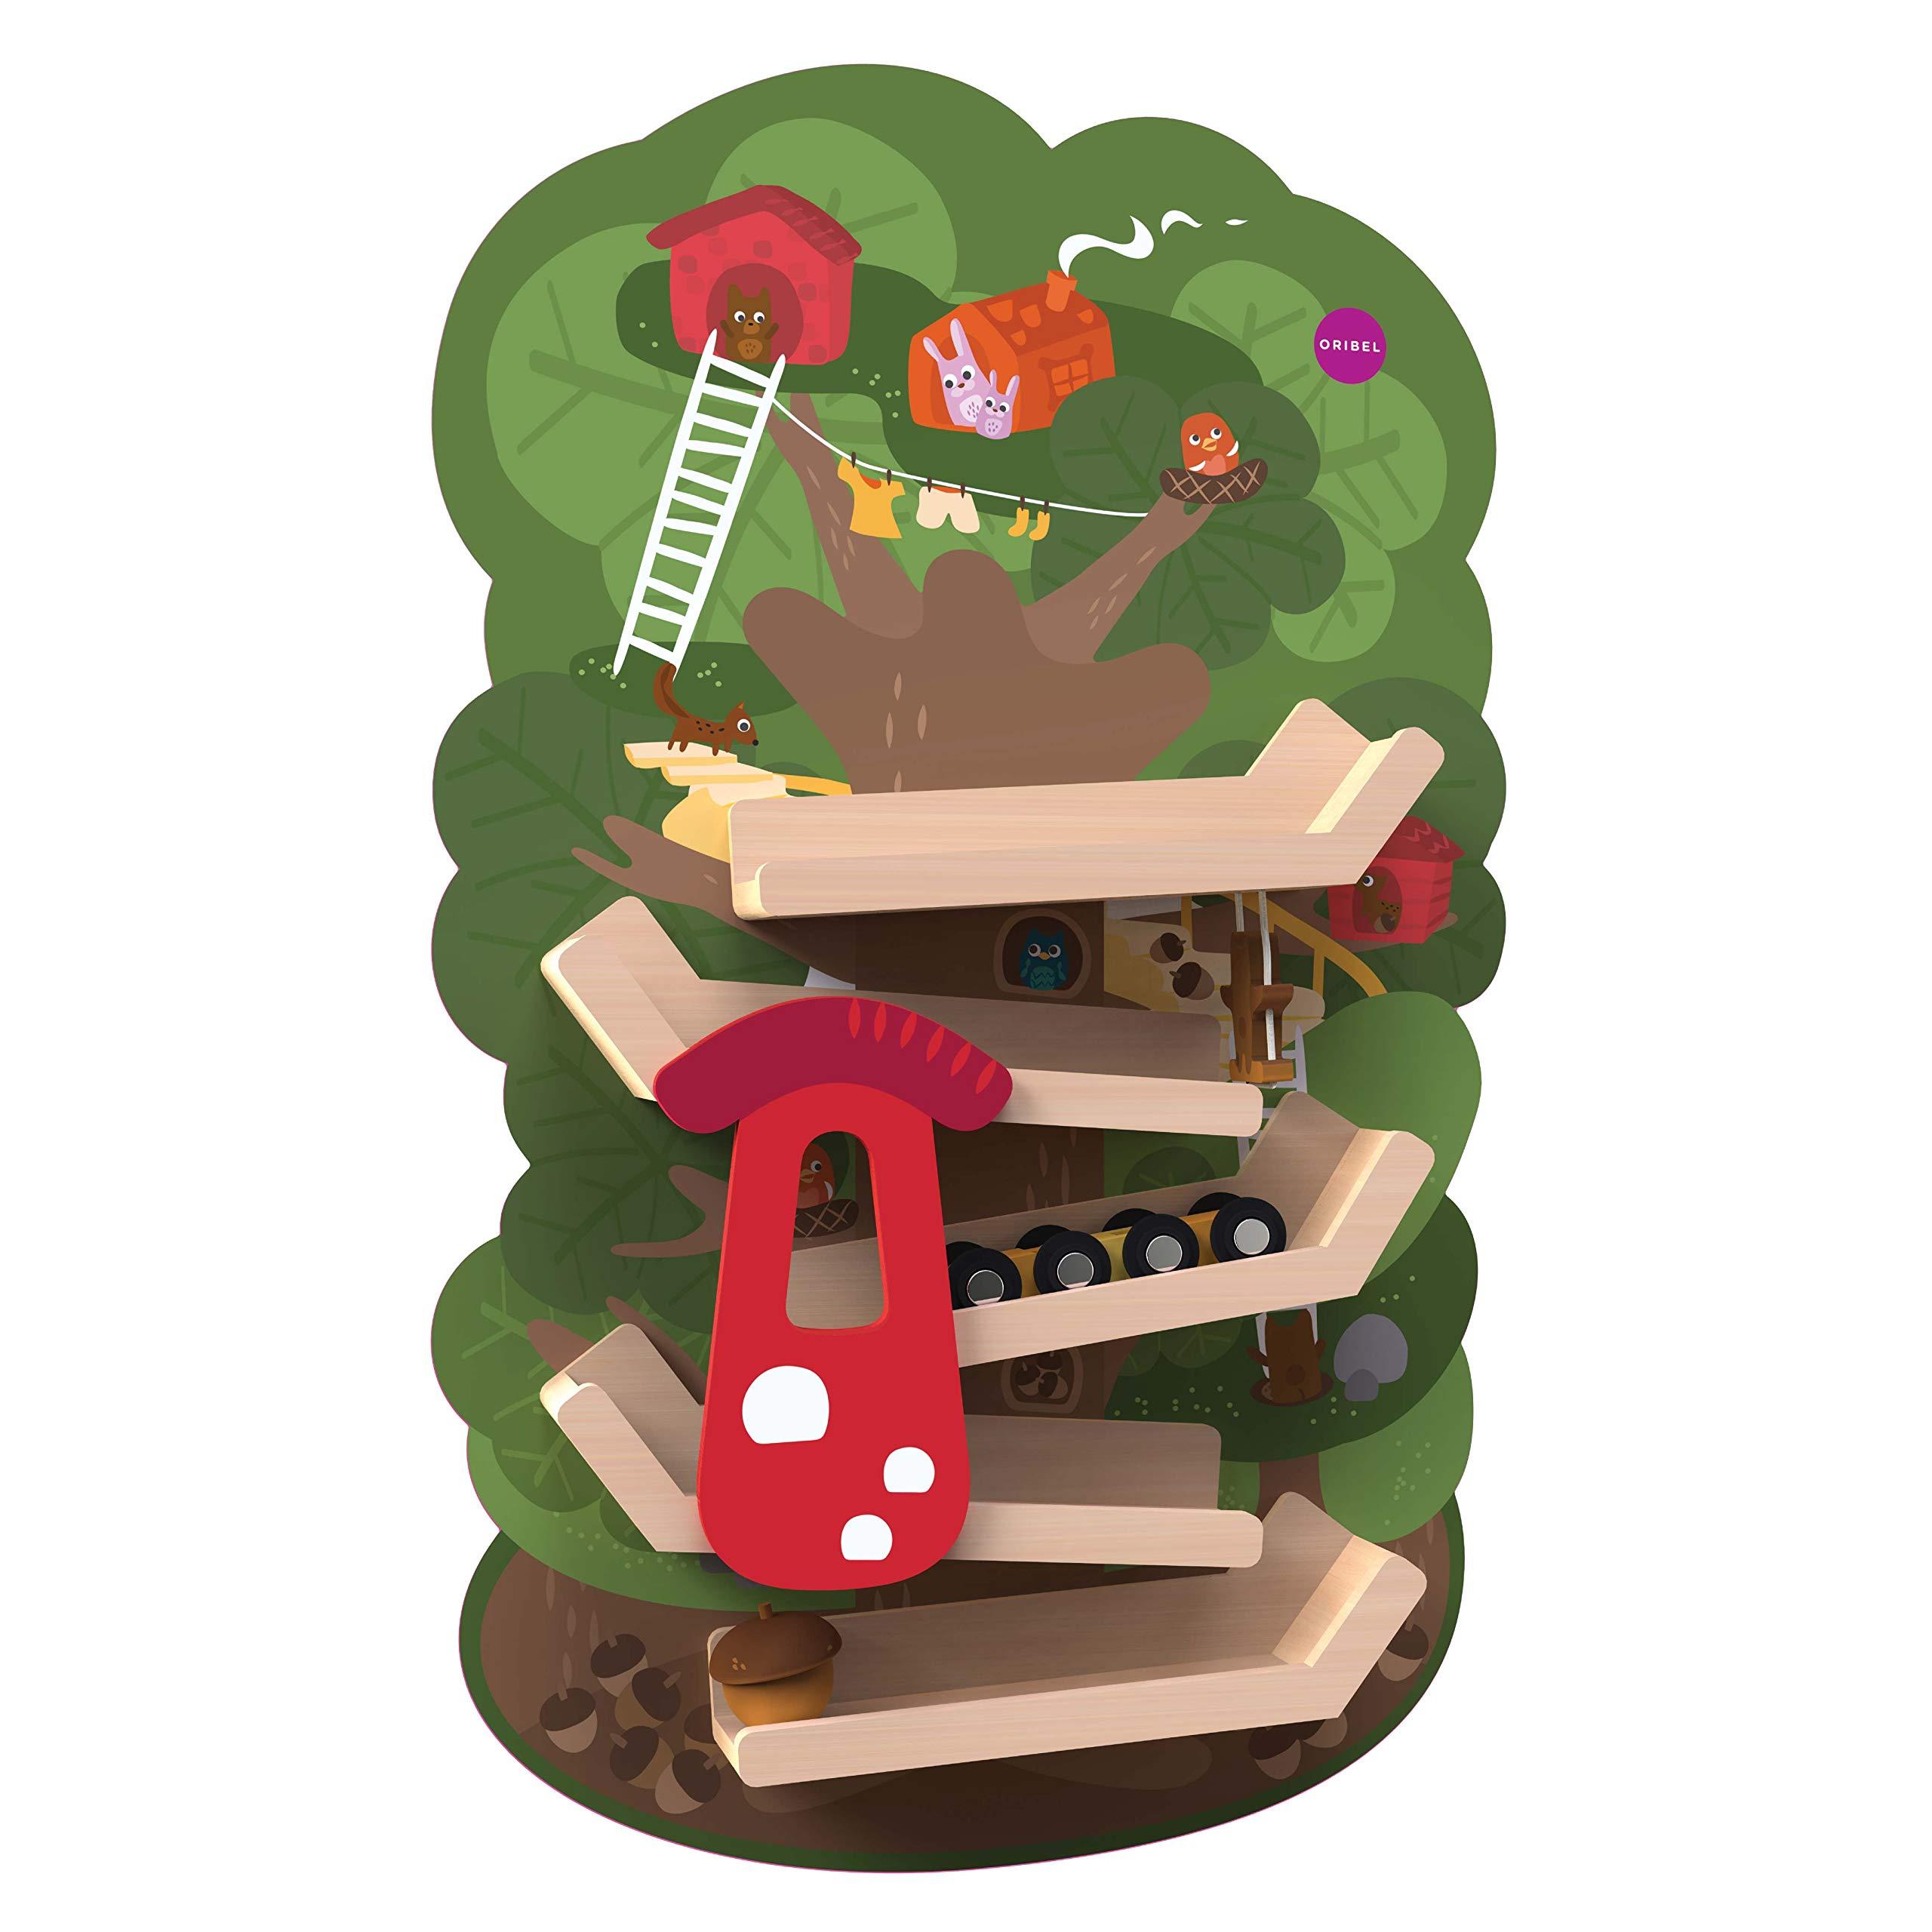 ORIBEL VertiPlay Wall Toys Play Wall Combo Set (Tree Top Adventure, Slidey Spidey, Woodpecker, Xylophone, Door Knocker) by ORIBEL (Image #4)